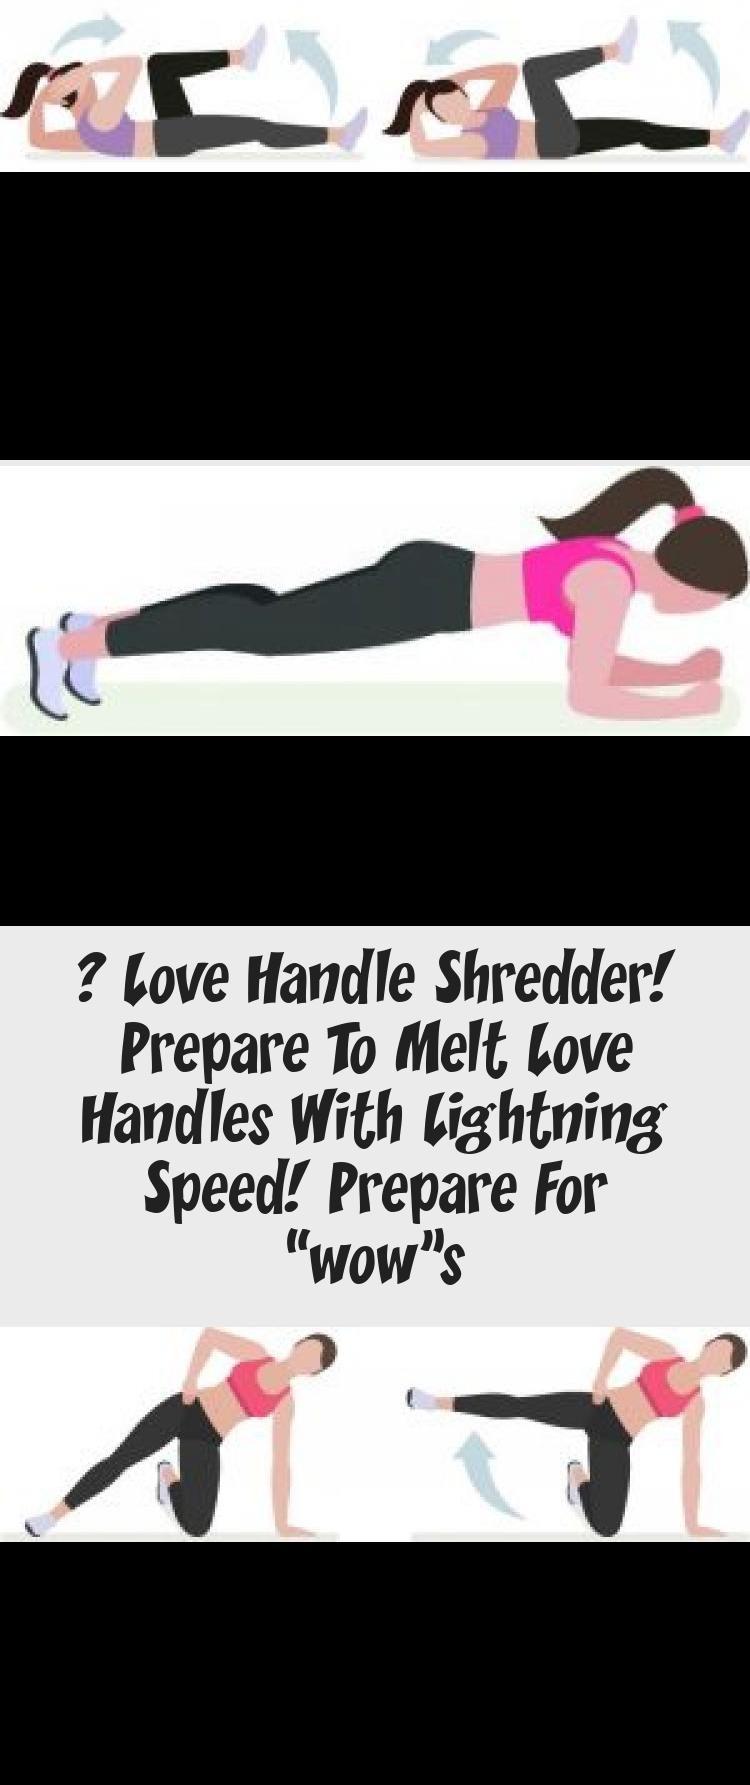 #fatburning #toner #fatloss #fatburn #fatburningworkout #exercise #fitness #getinshapefast #shapes #...